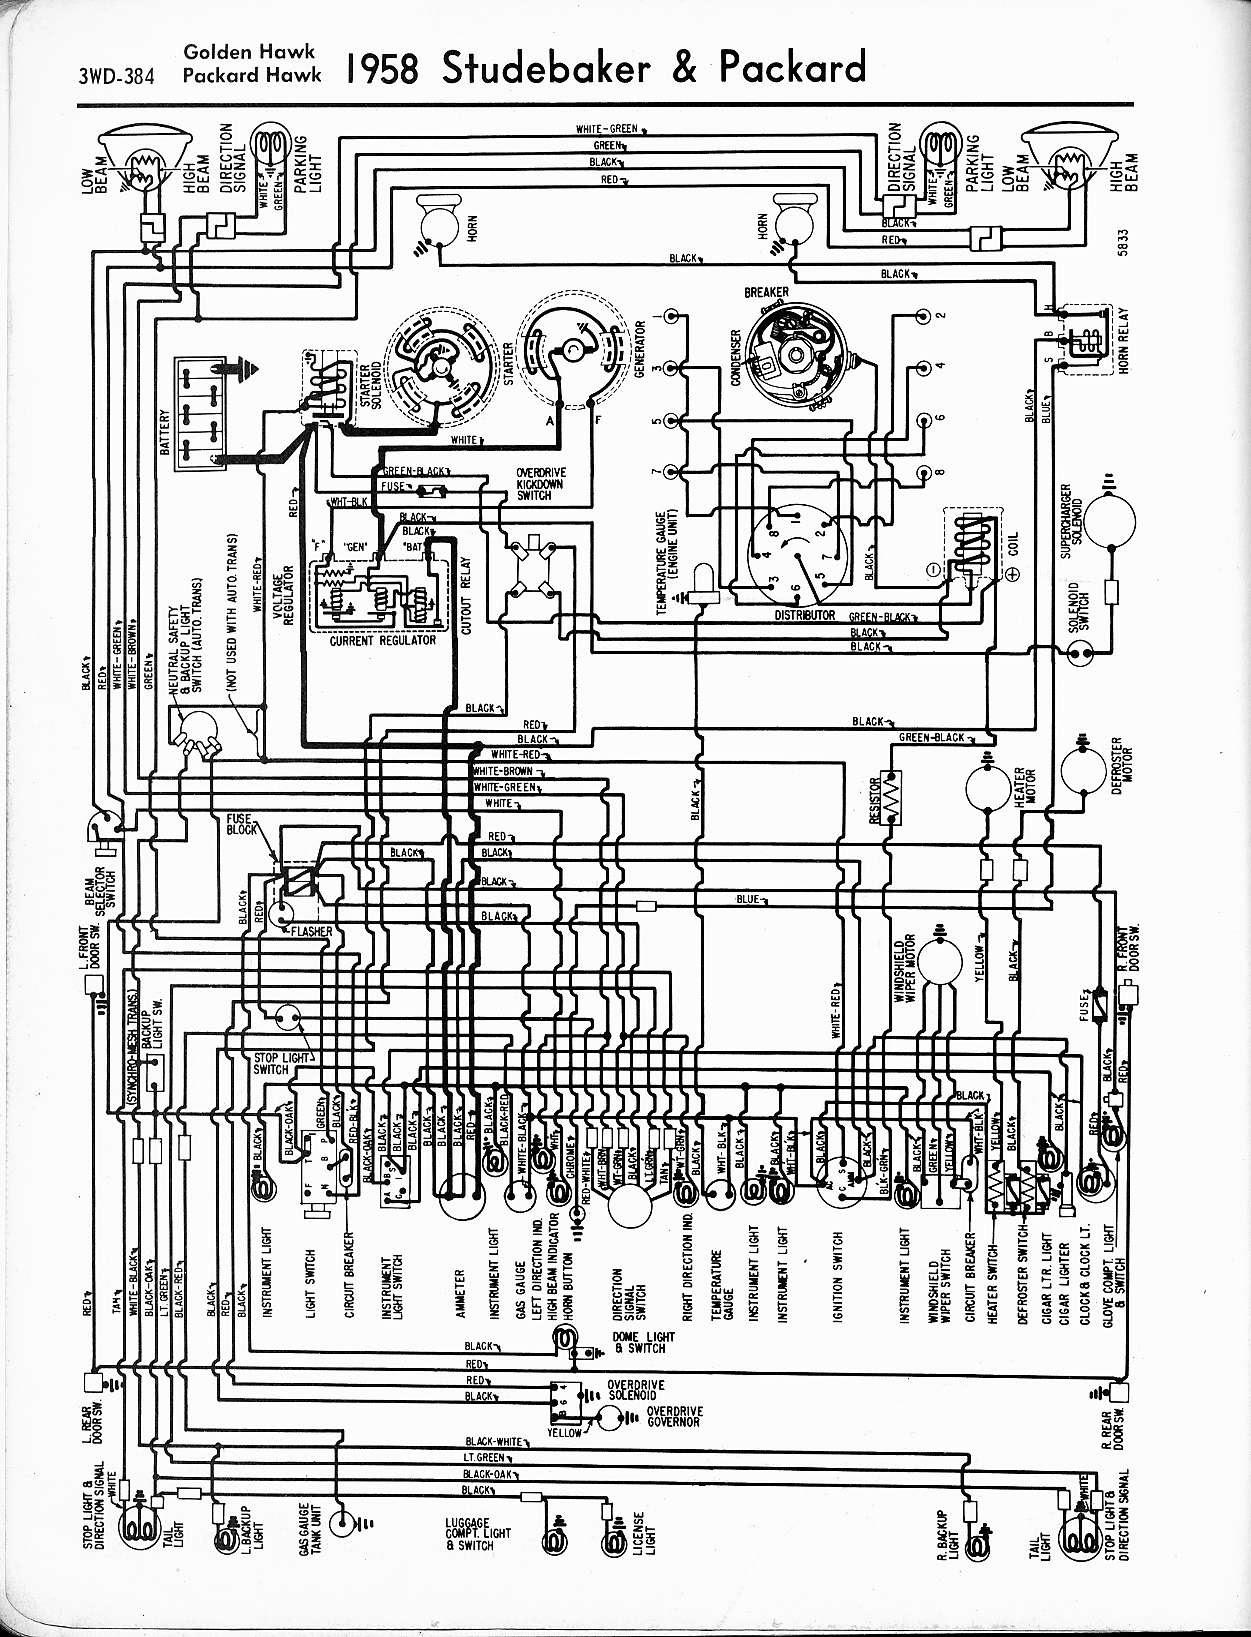 1951 Studebaker Champion Wiring Diagram - Cb Radio Mic Wiring for Wiring  Diagram Schematics | 1981 Champion Wiring Diagram |  | Wiring Diagram Schematics